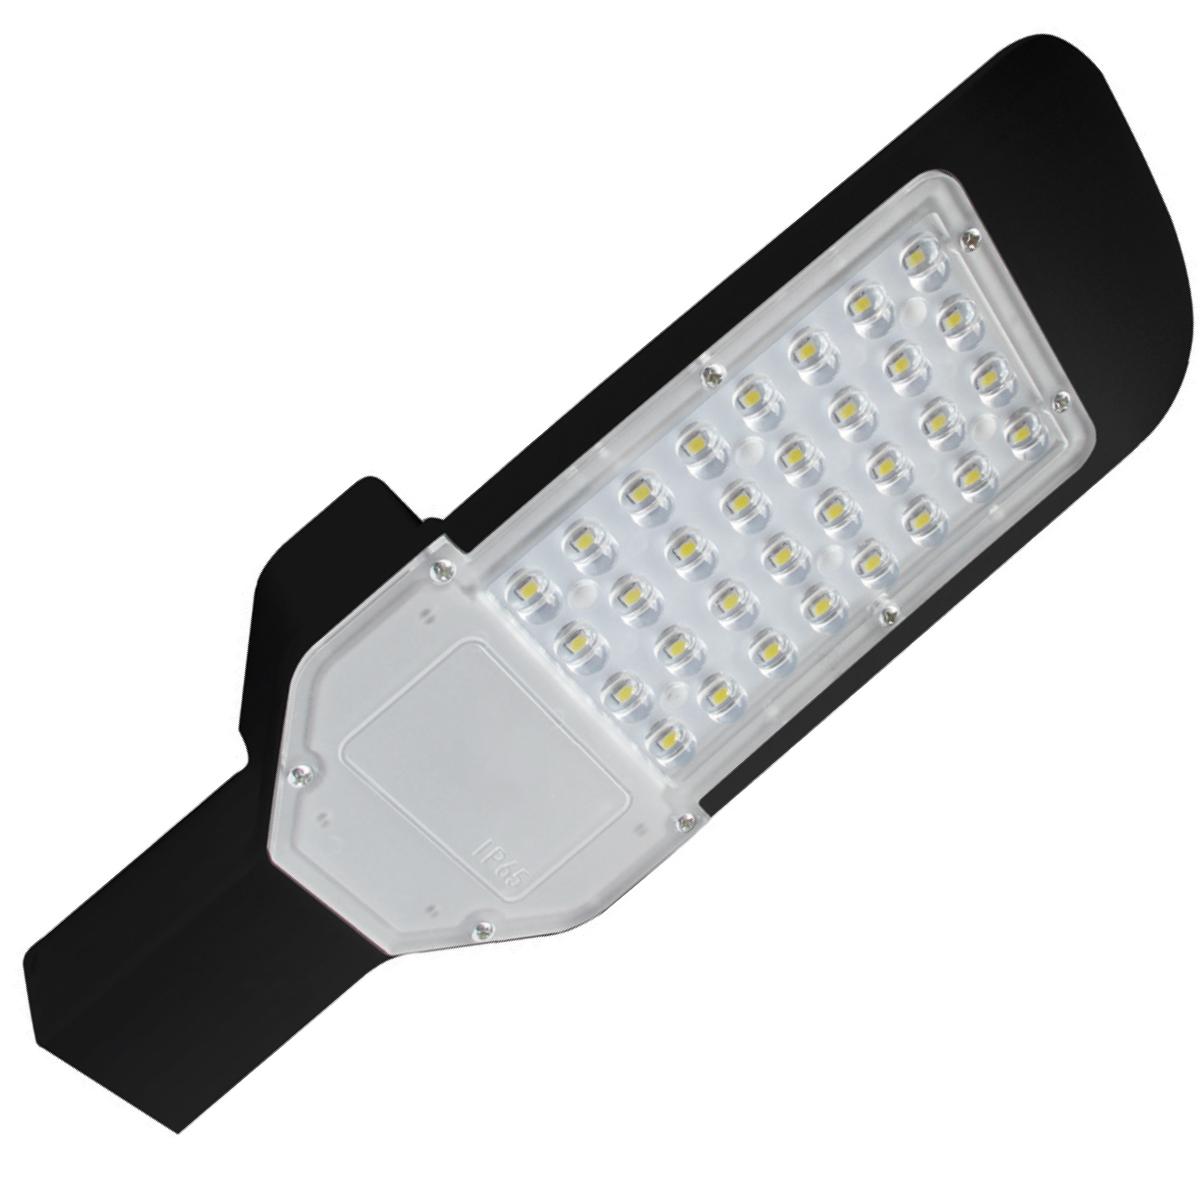 LED Straatlamp - Orny - 30W - Helder/Koud Wit 6400K - Waterdicht IP65 - Mat Zwart - Aluminium